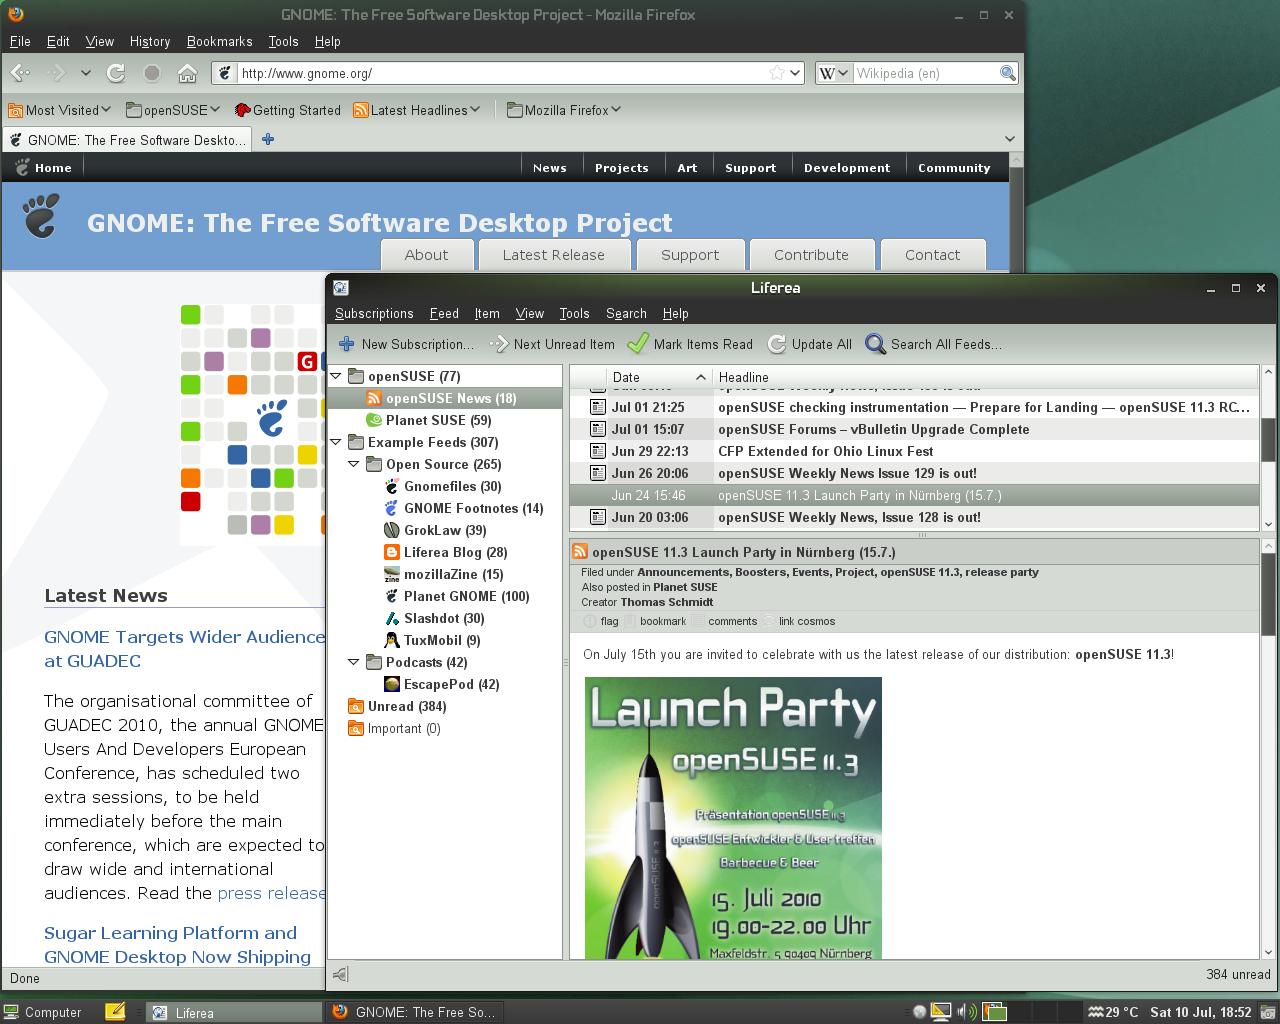 HOWTO: Install LTSP server in Ubuntu Linux - YouTube